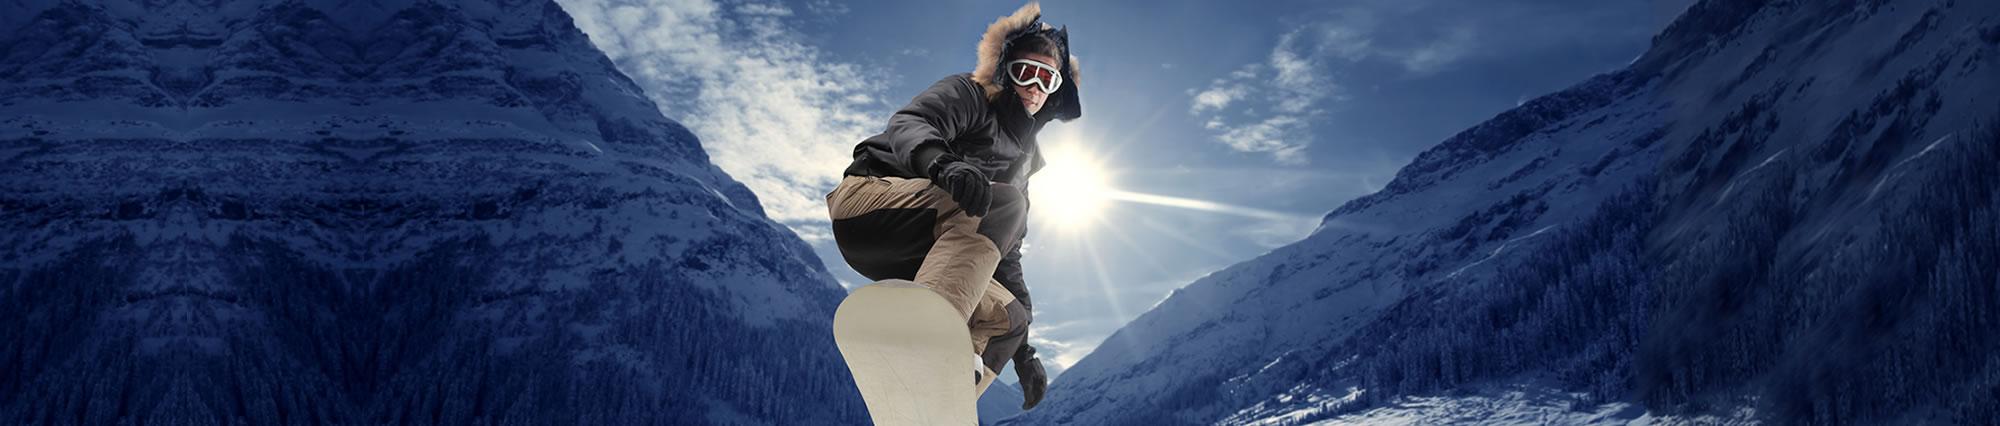 Whistler Mountain Snowboarding